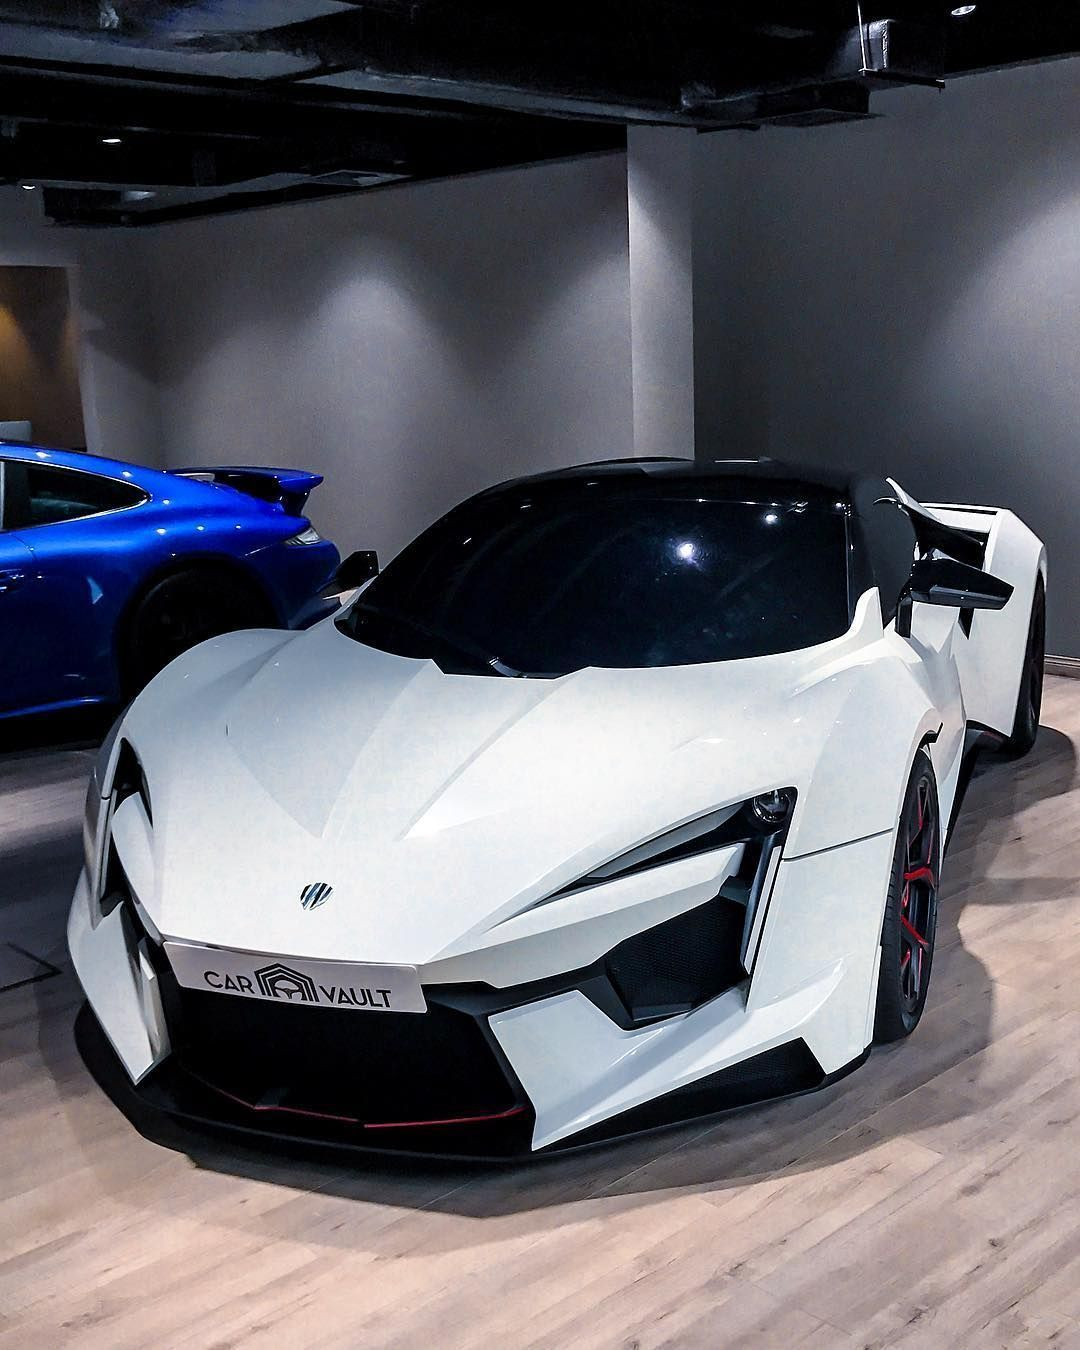 Custom Supercar 2019 Motor Custom Motor Supercar Luxury Cars In 2020 Super Cars Fast Sports Cars Street Racing Cars